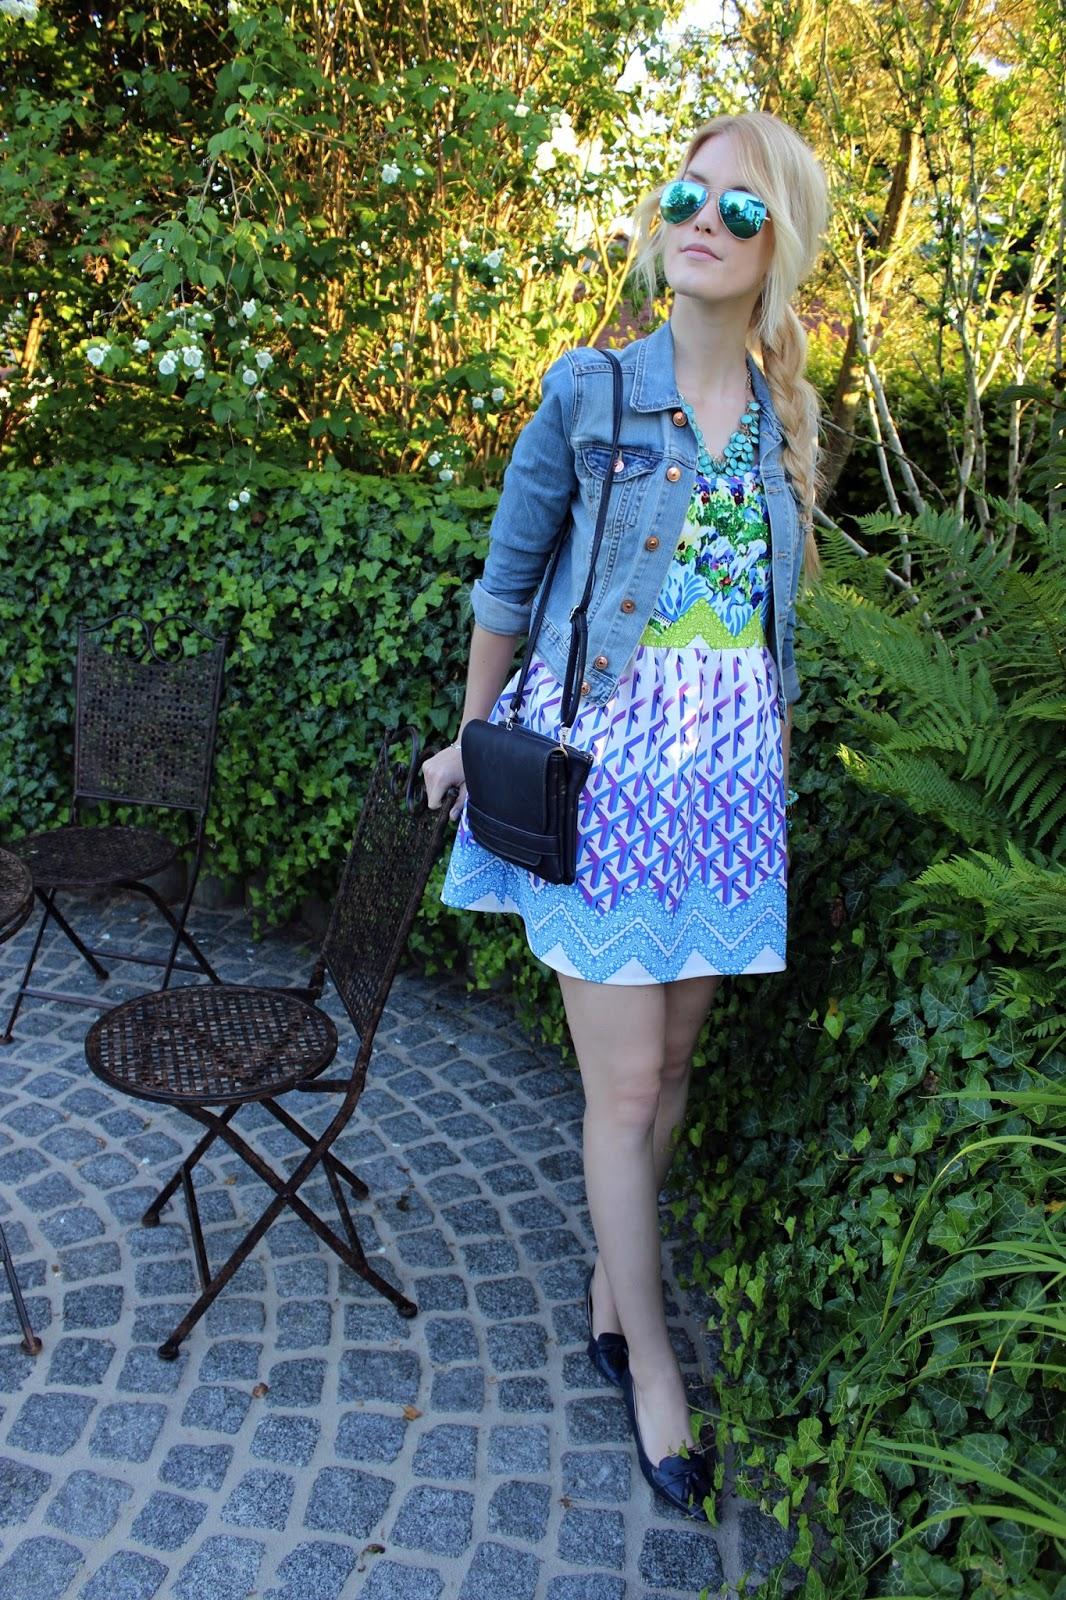 Dress Kleid TheBlondeLion Outfit Jeansjacke Prints Blonde Braid Casual